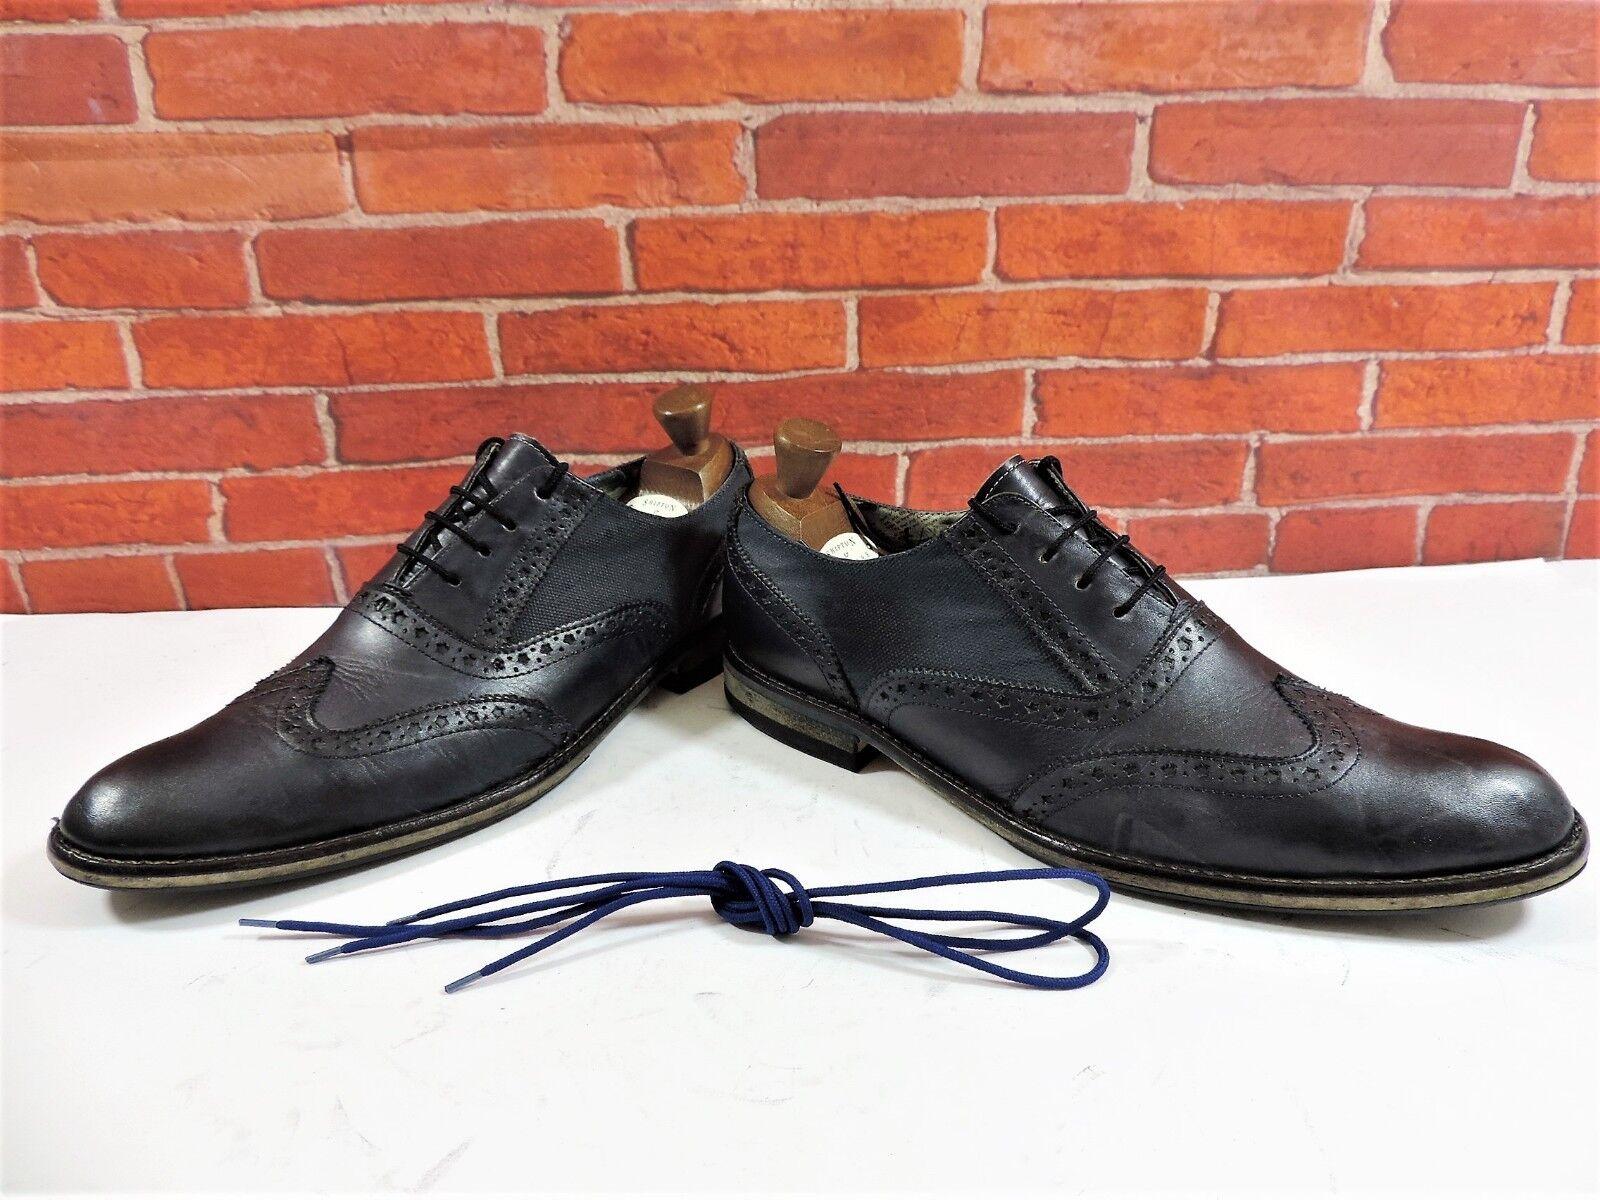 Paolo Paolo Paolo Vandini Herrenhalbschuhe UK 10 Us 11 Eu 44 Marineblau Schuhe Smith c5deb8